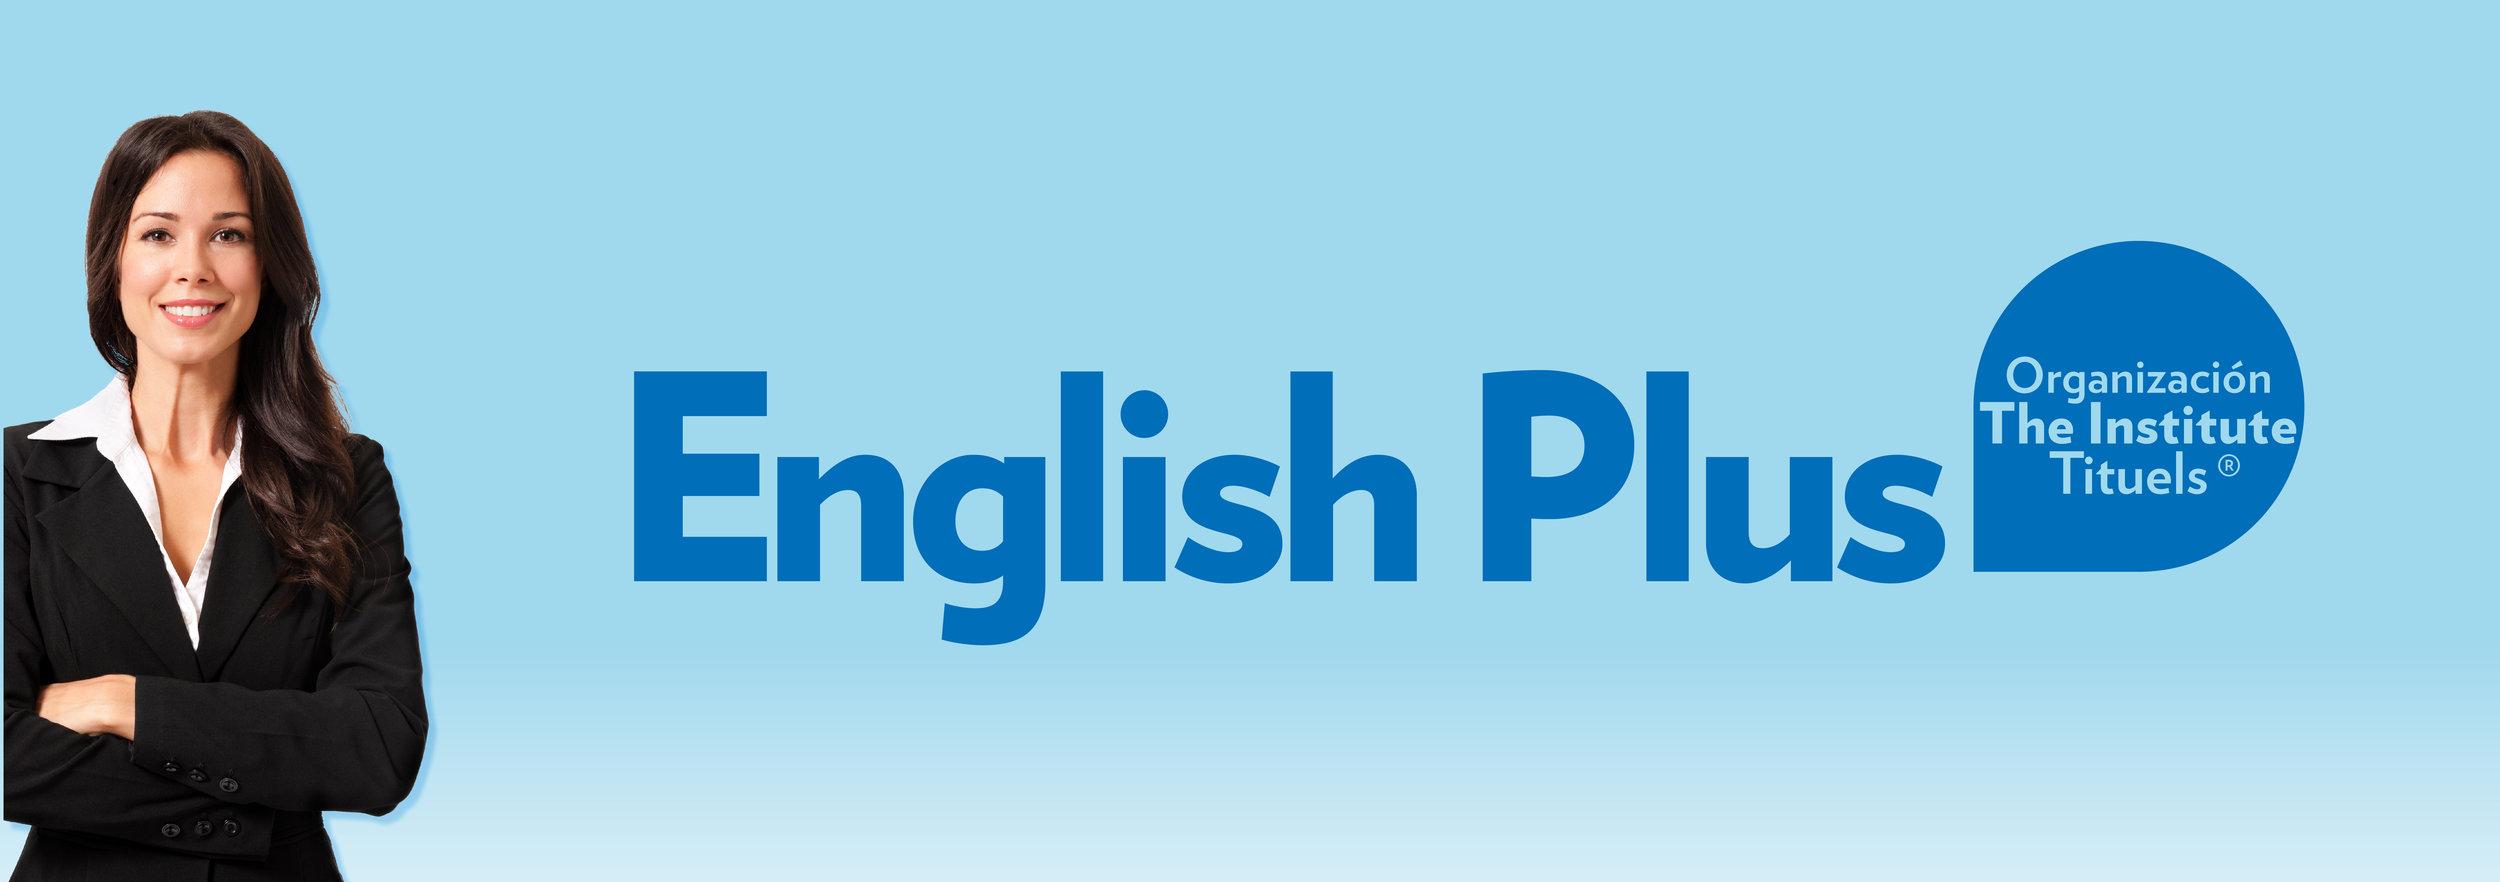 englishpath banner-06.jpg